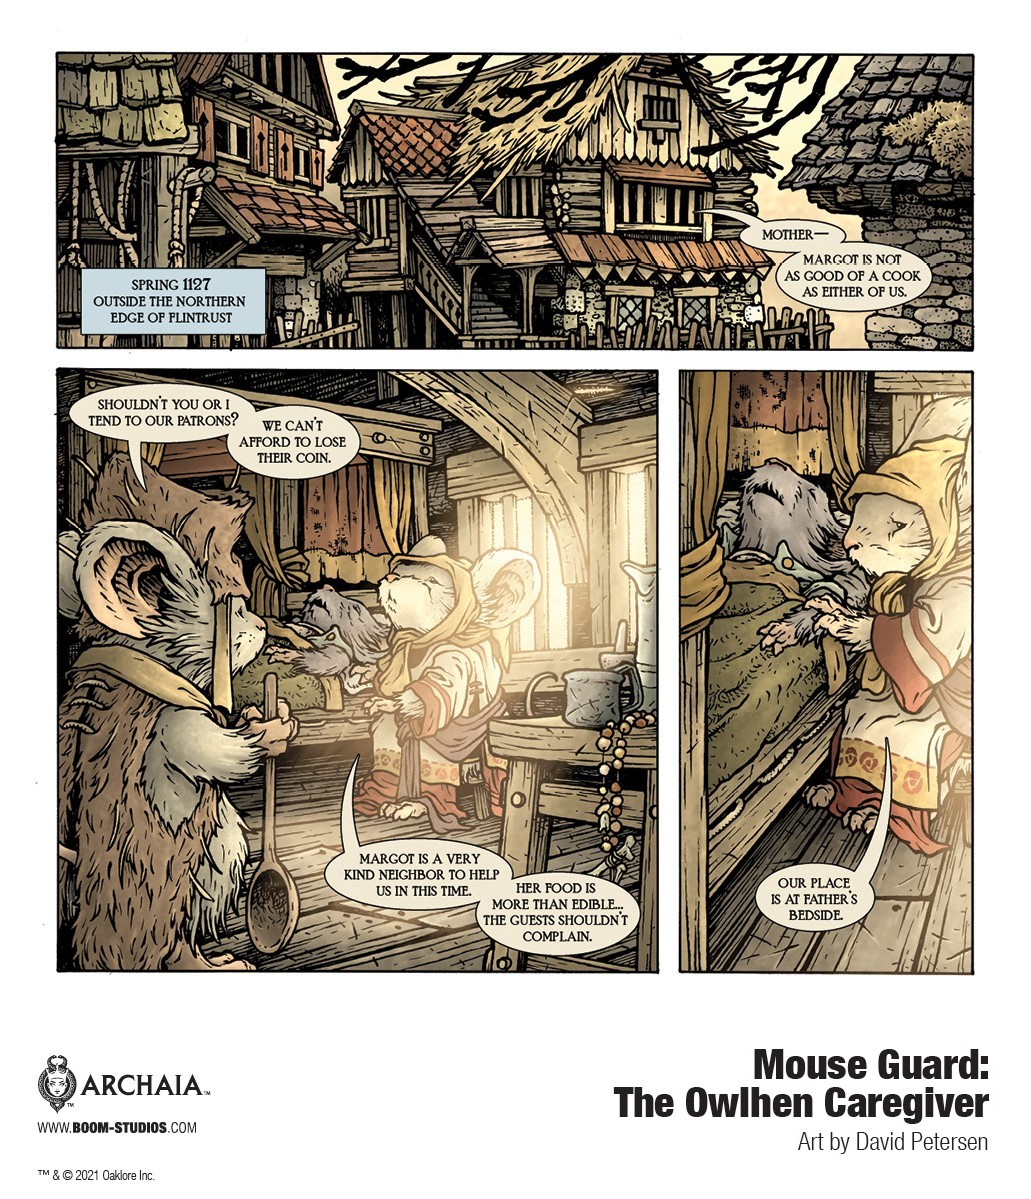 MouseGuard_OwlhenCaregiver_InteriorArt_001_PROMO MOUSE GUARD welcomes back David Petersen in THE OWLHEN CAREGIVER